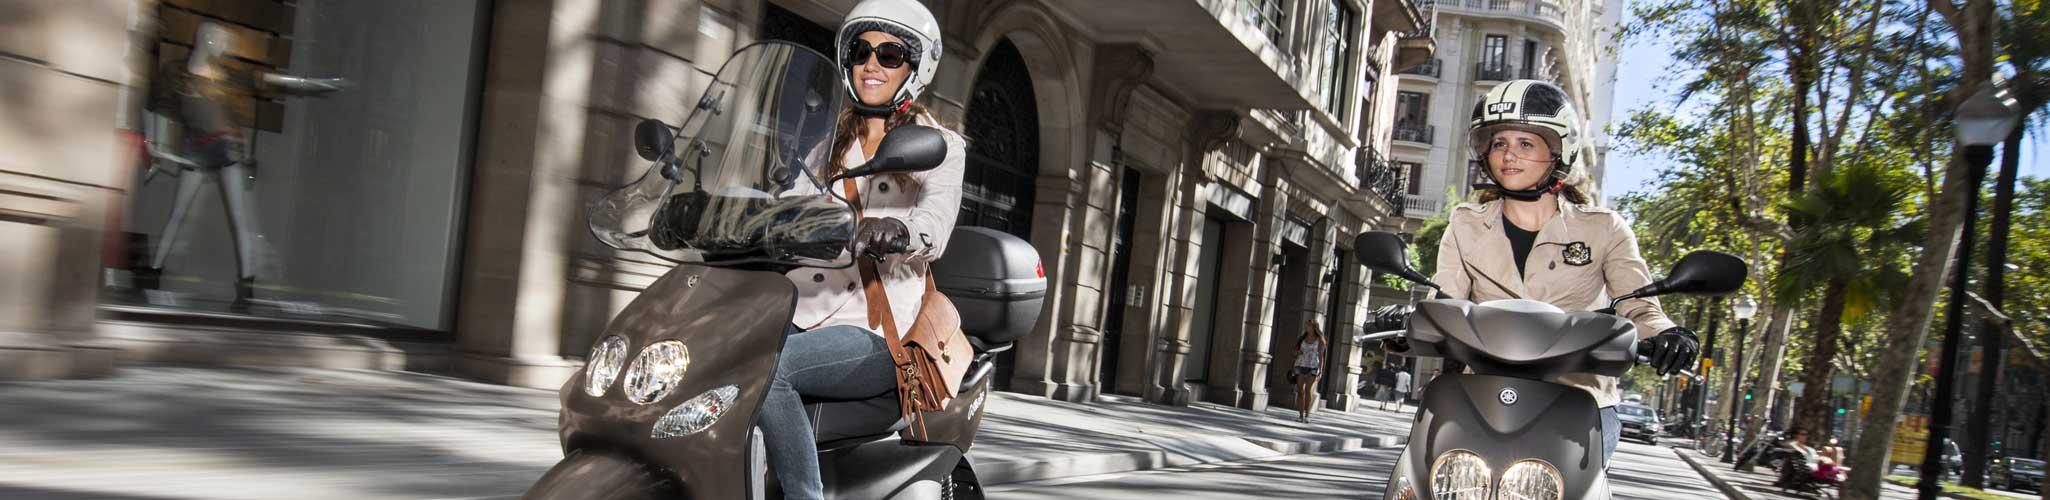 Scooter kopen | MotorCentrumWest